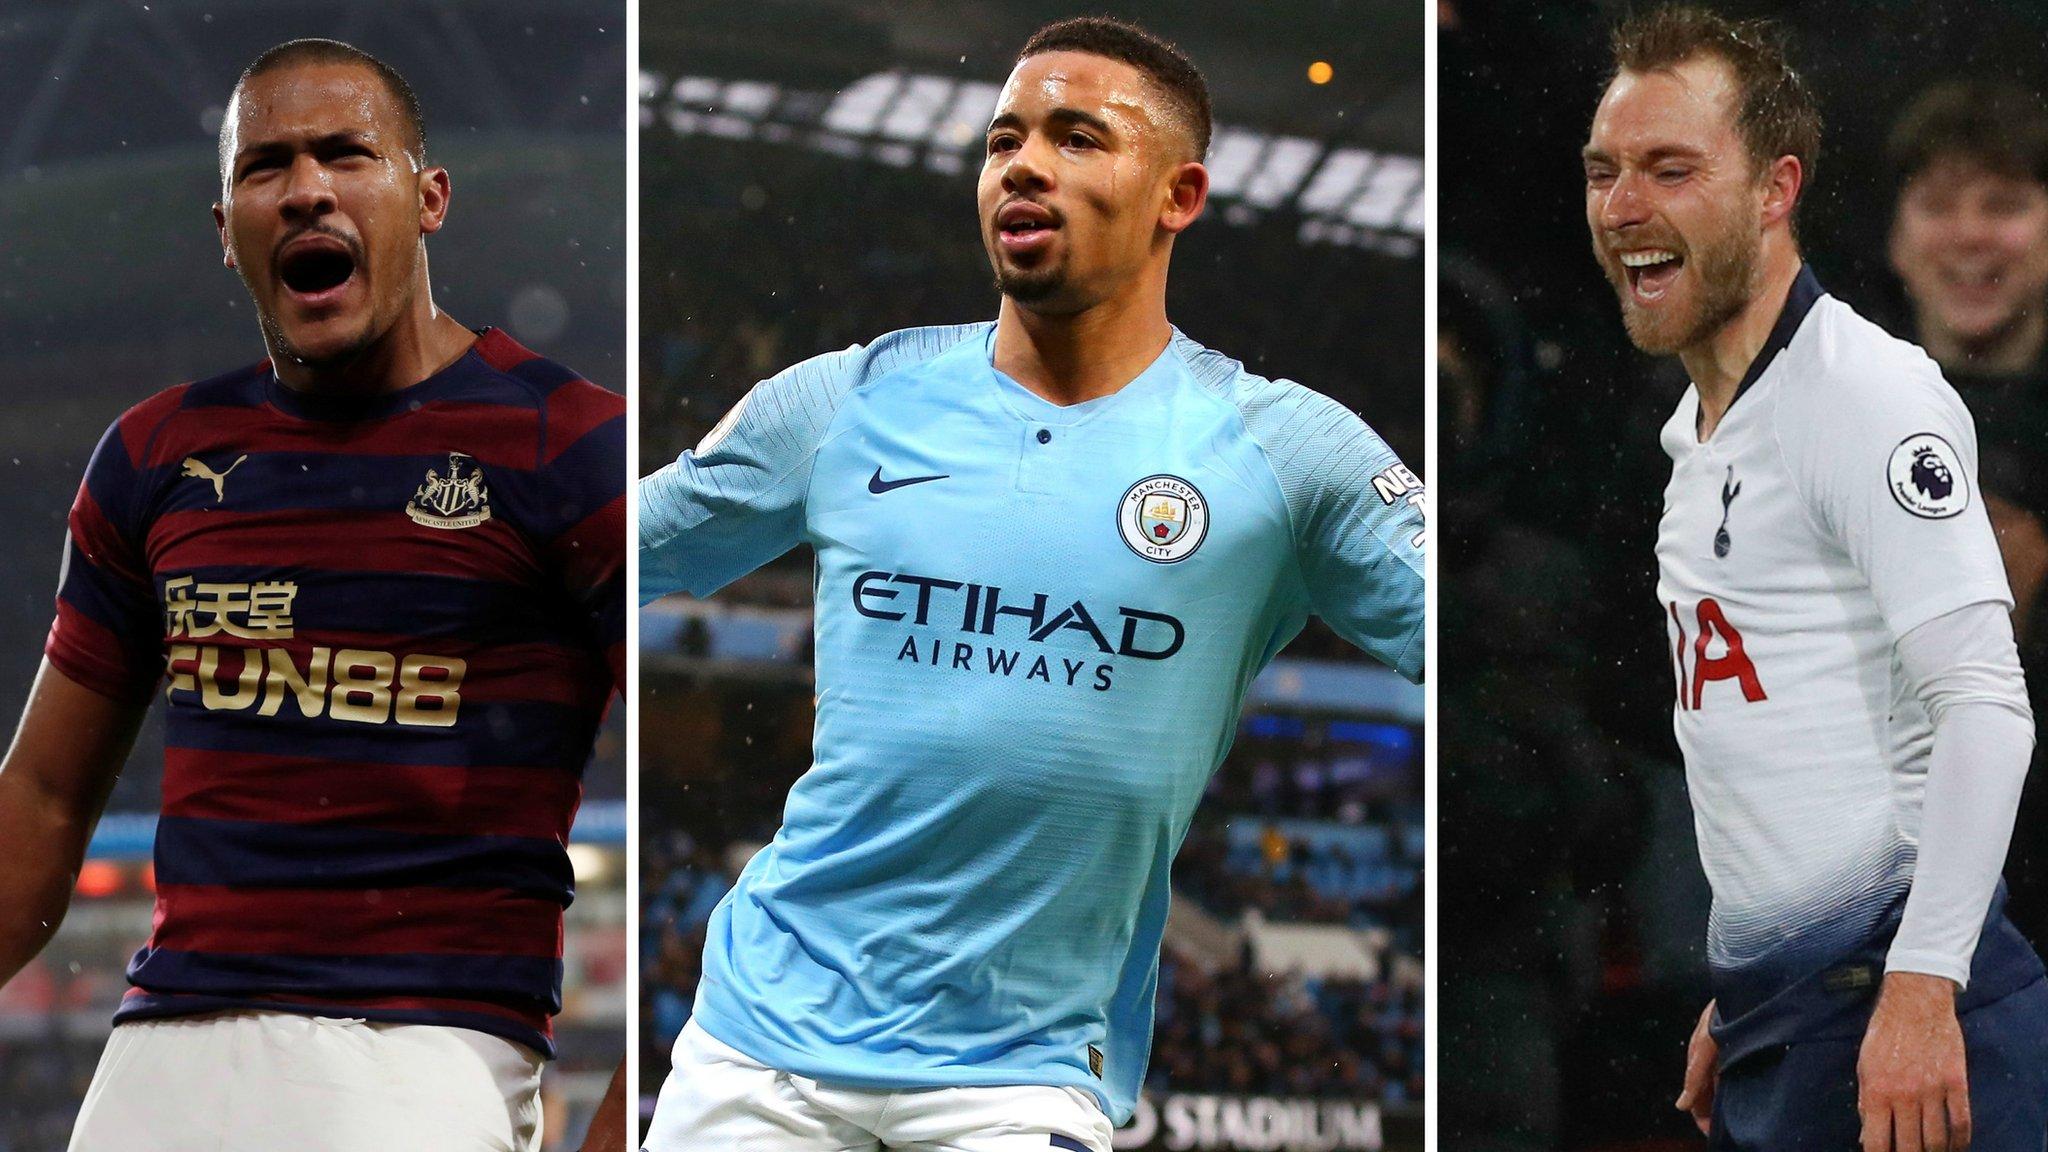 Premier League round-up: Man City go top, Tottenham score late winner